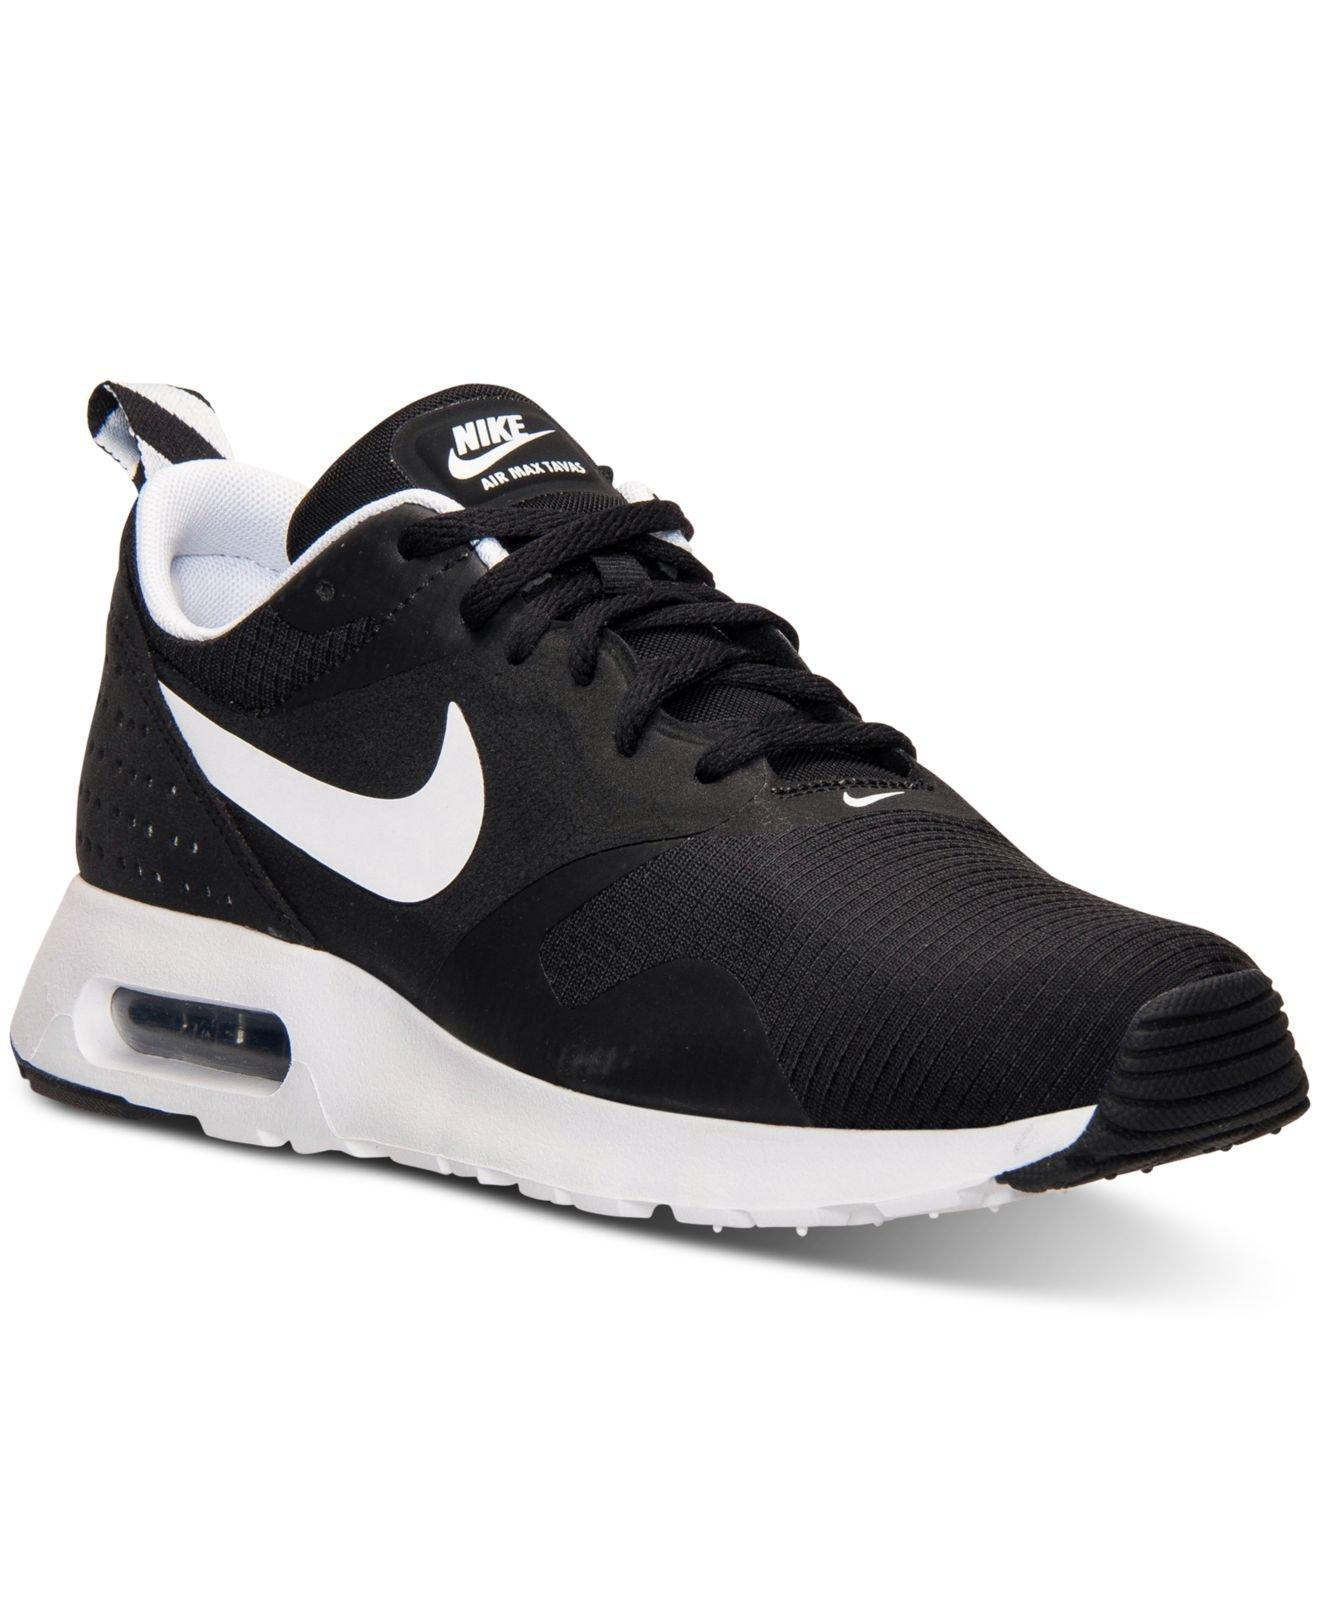 Lyst - Nike Men's Air Max Tavas Running Sneakers From ...